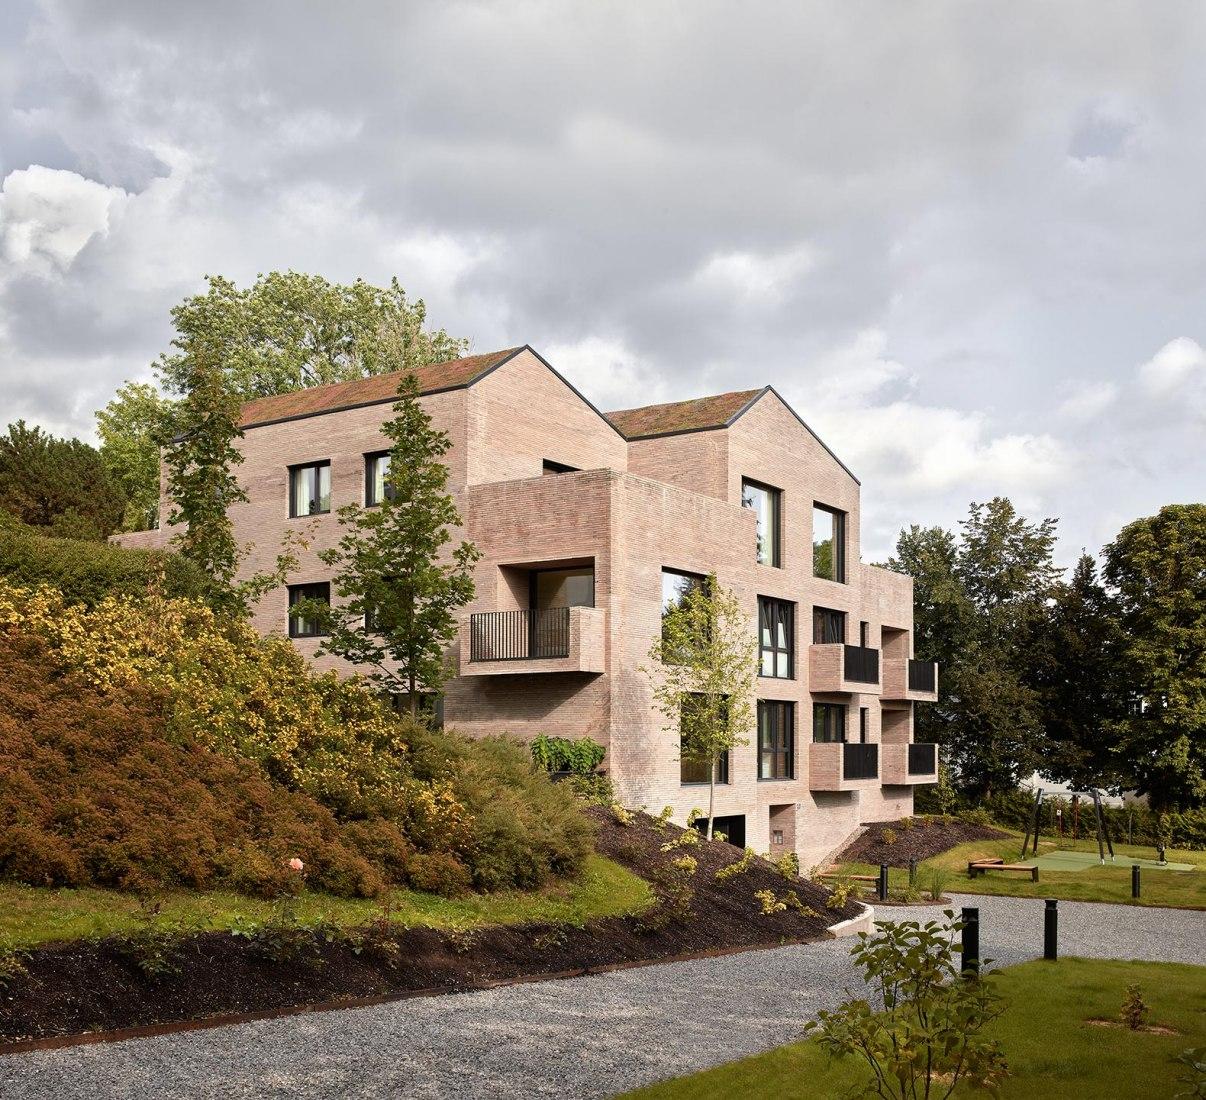 Villa Ask by Reiulf Ramstad Arkitekter. Photograph by Mariela Apollonio